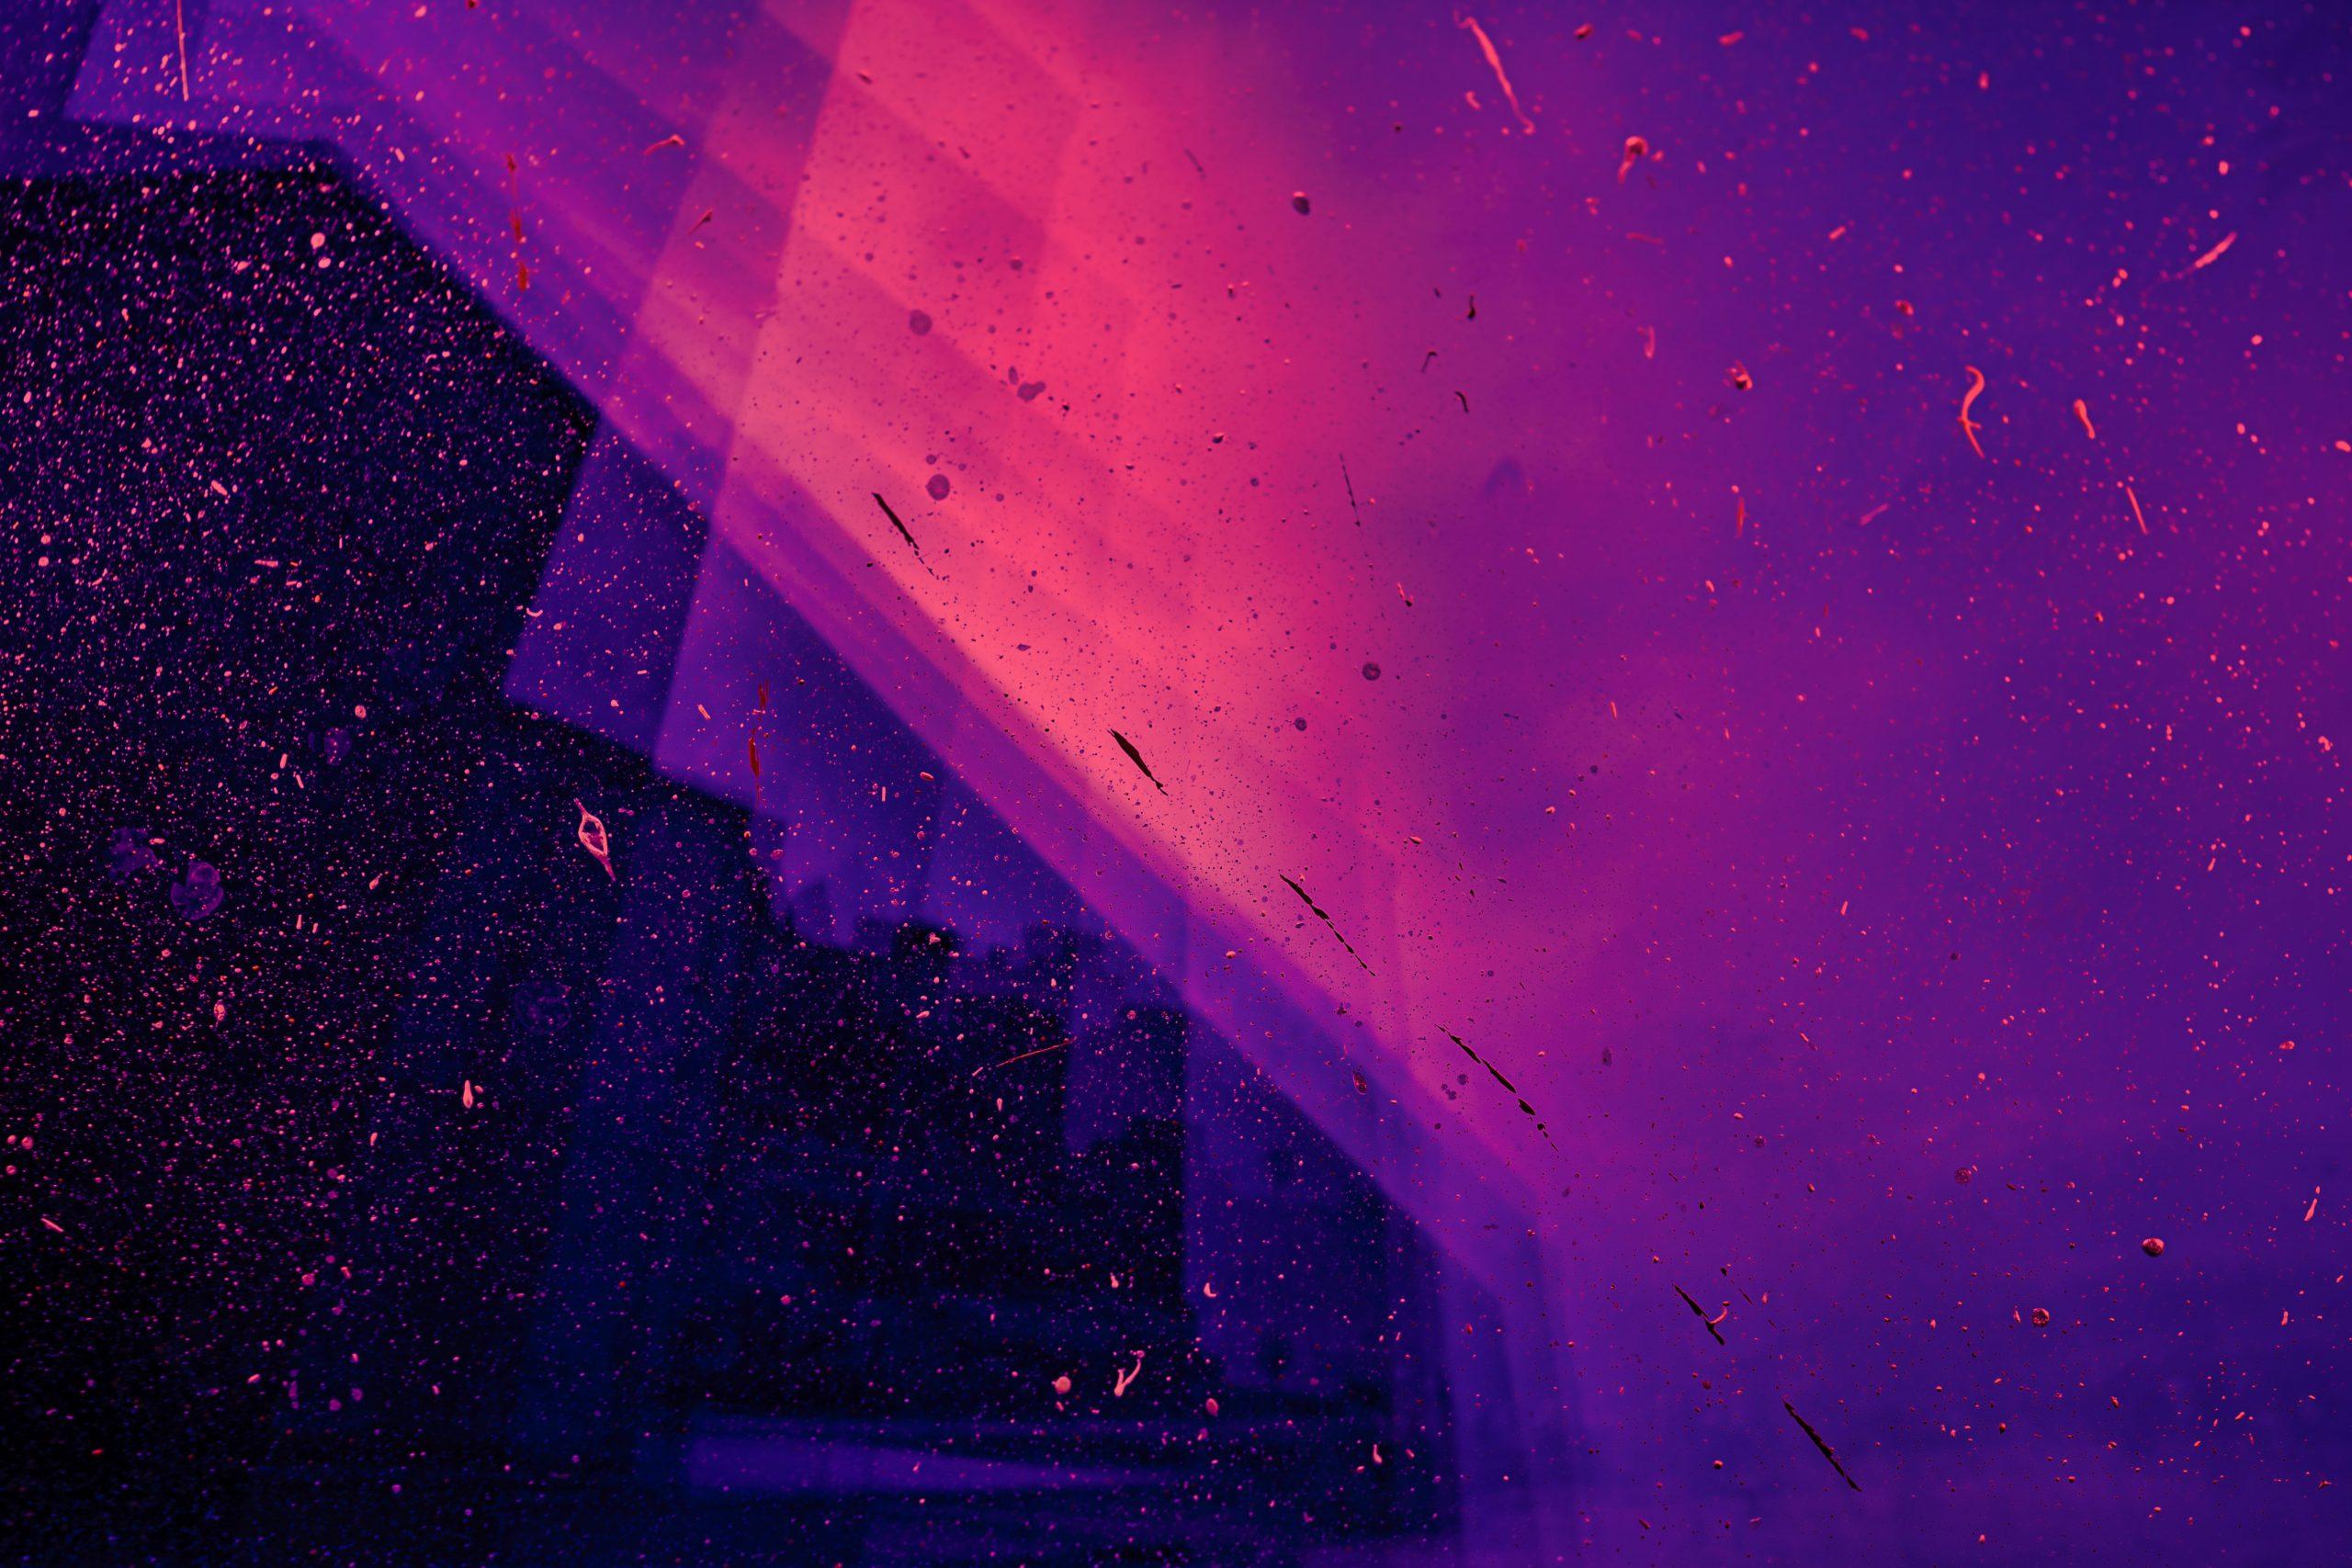 Aesthetic Wallpaper Pink And Black Wallpaper Wallpaper For You The Best Wallpaper For Desktop Mobile